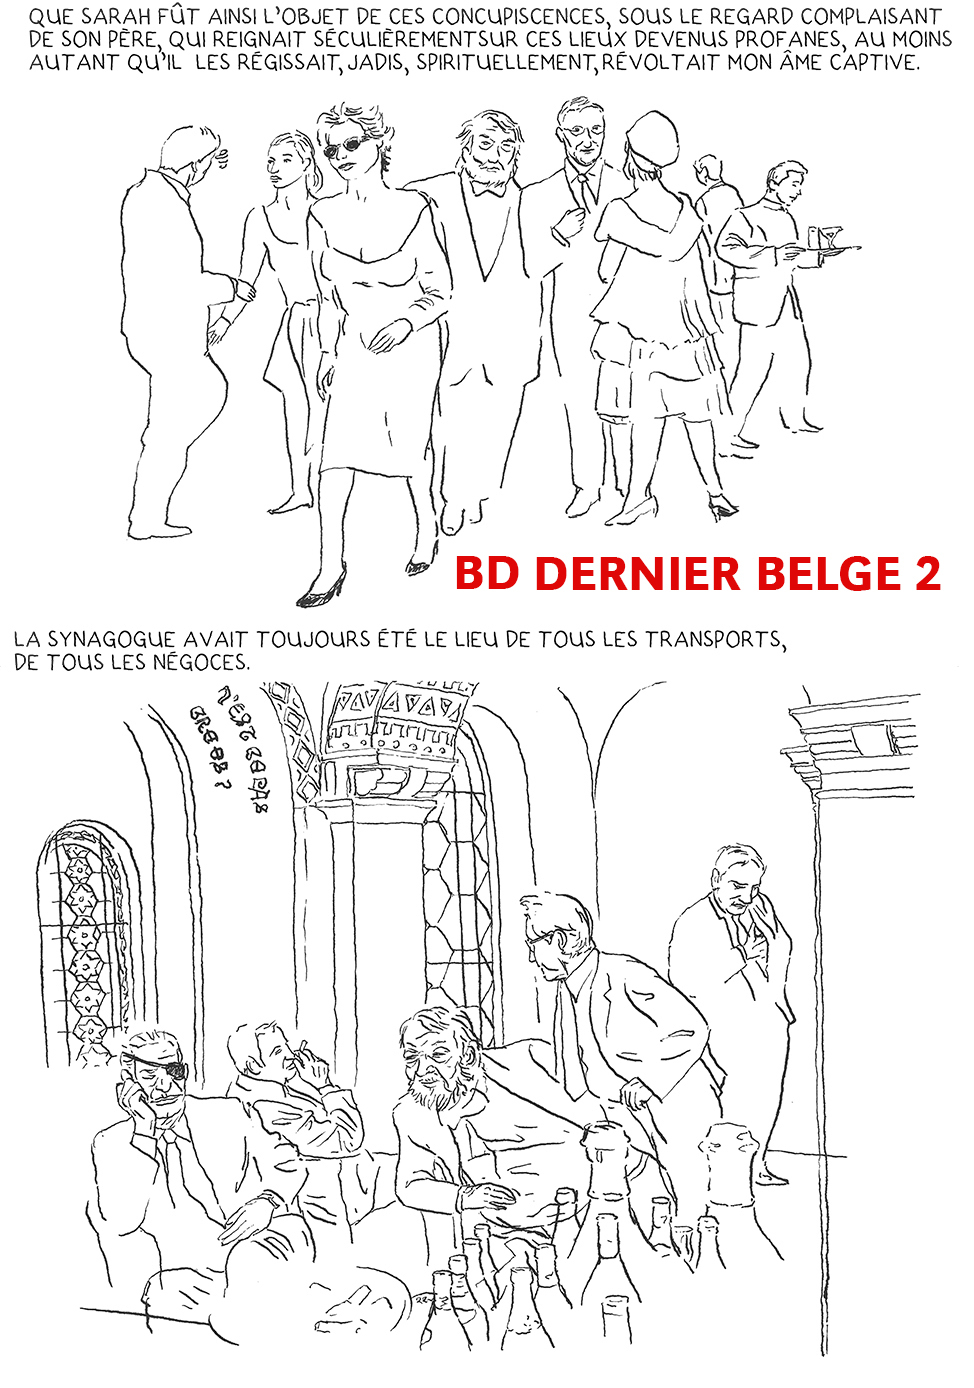 bd_dernier belge_2